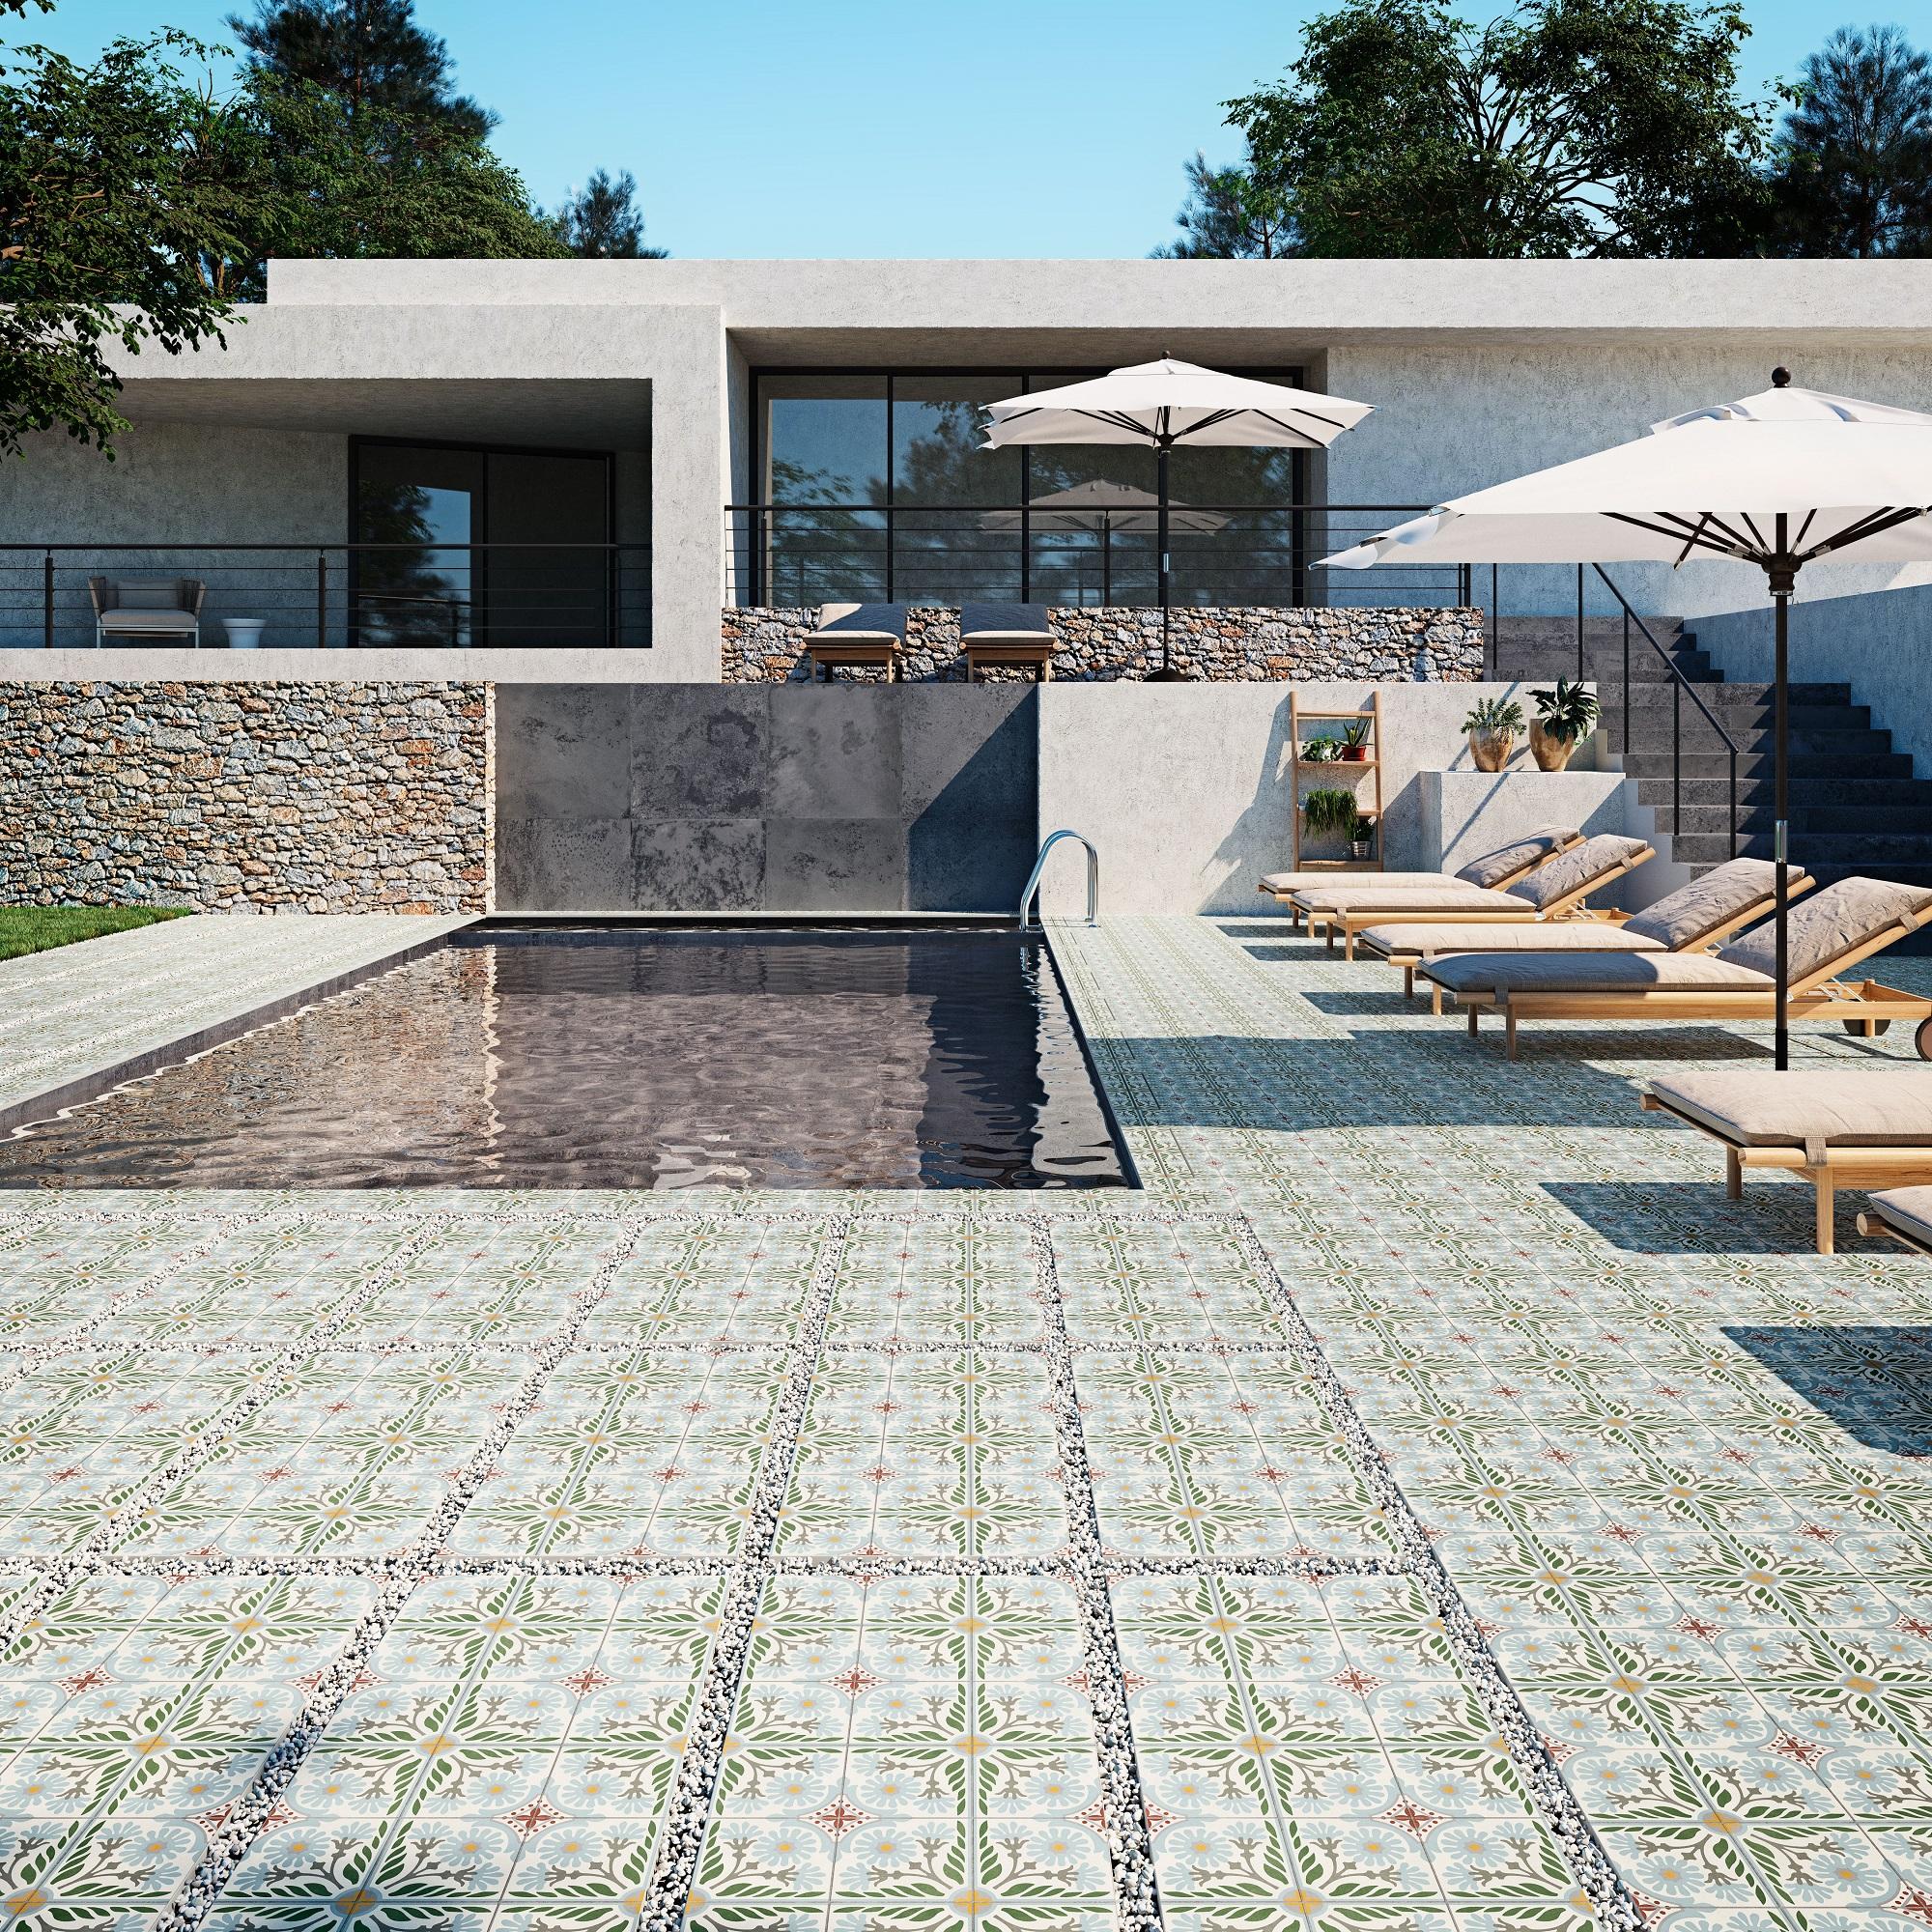 ALTEA-oliva-Terrassenplatten_kiesbett_steine_verlegen